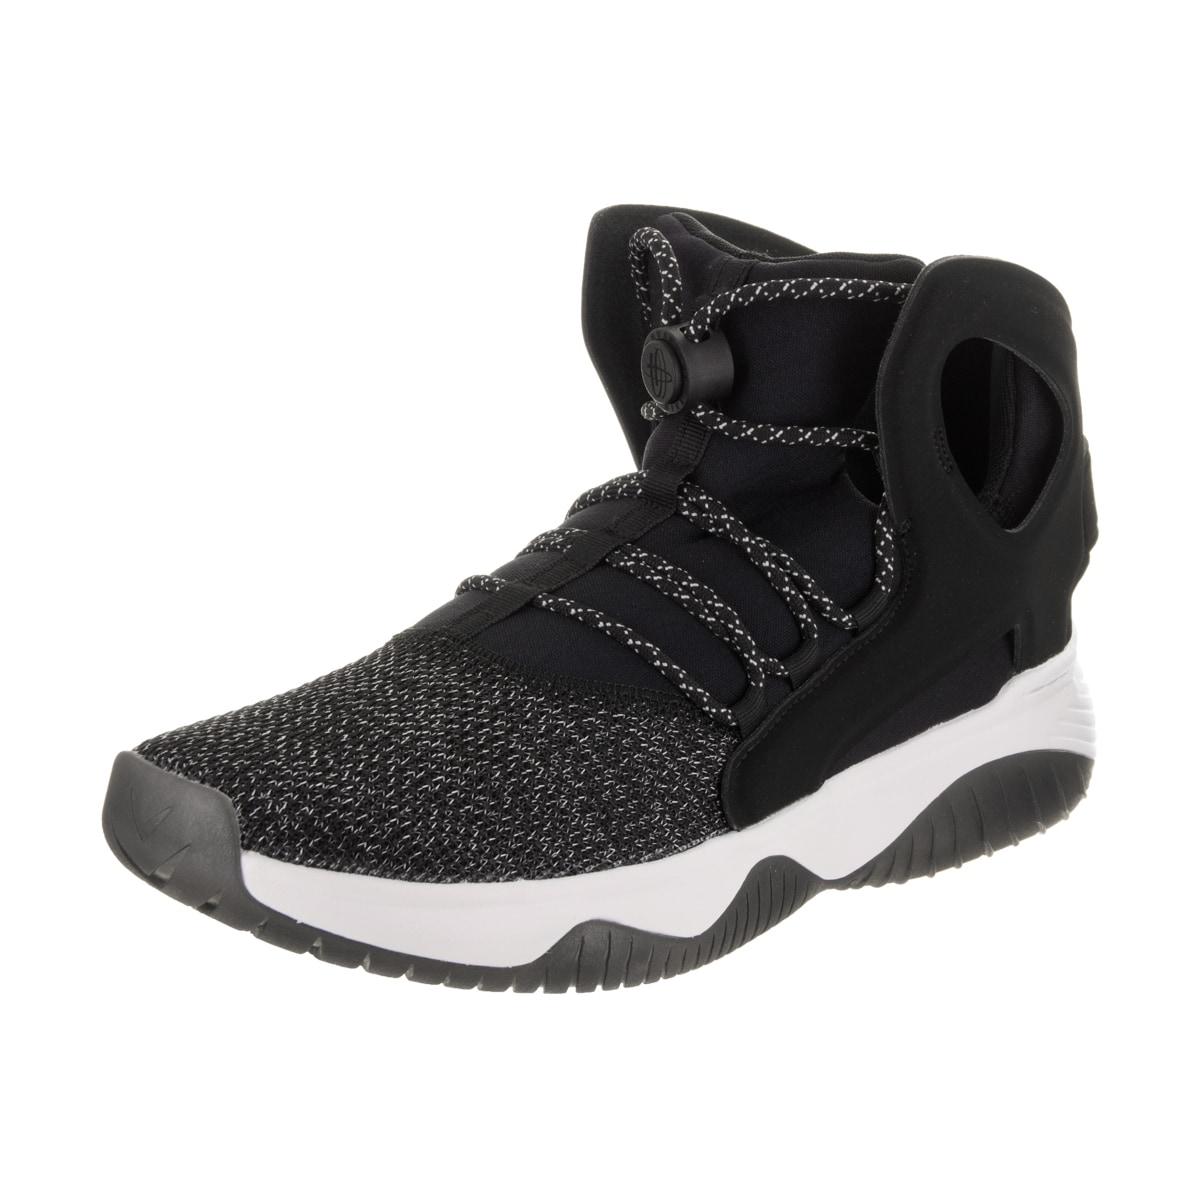 4914df97f447 Details about Nike Men s Air Flight Huarache Ultra Black Nubuck Basketball  Shoe